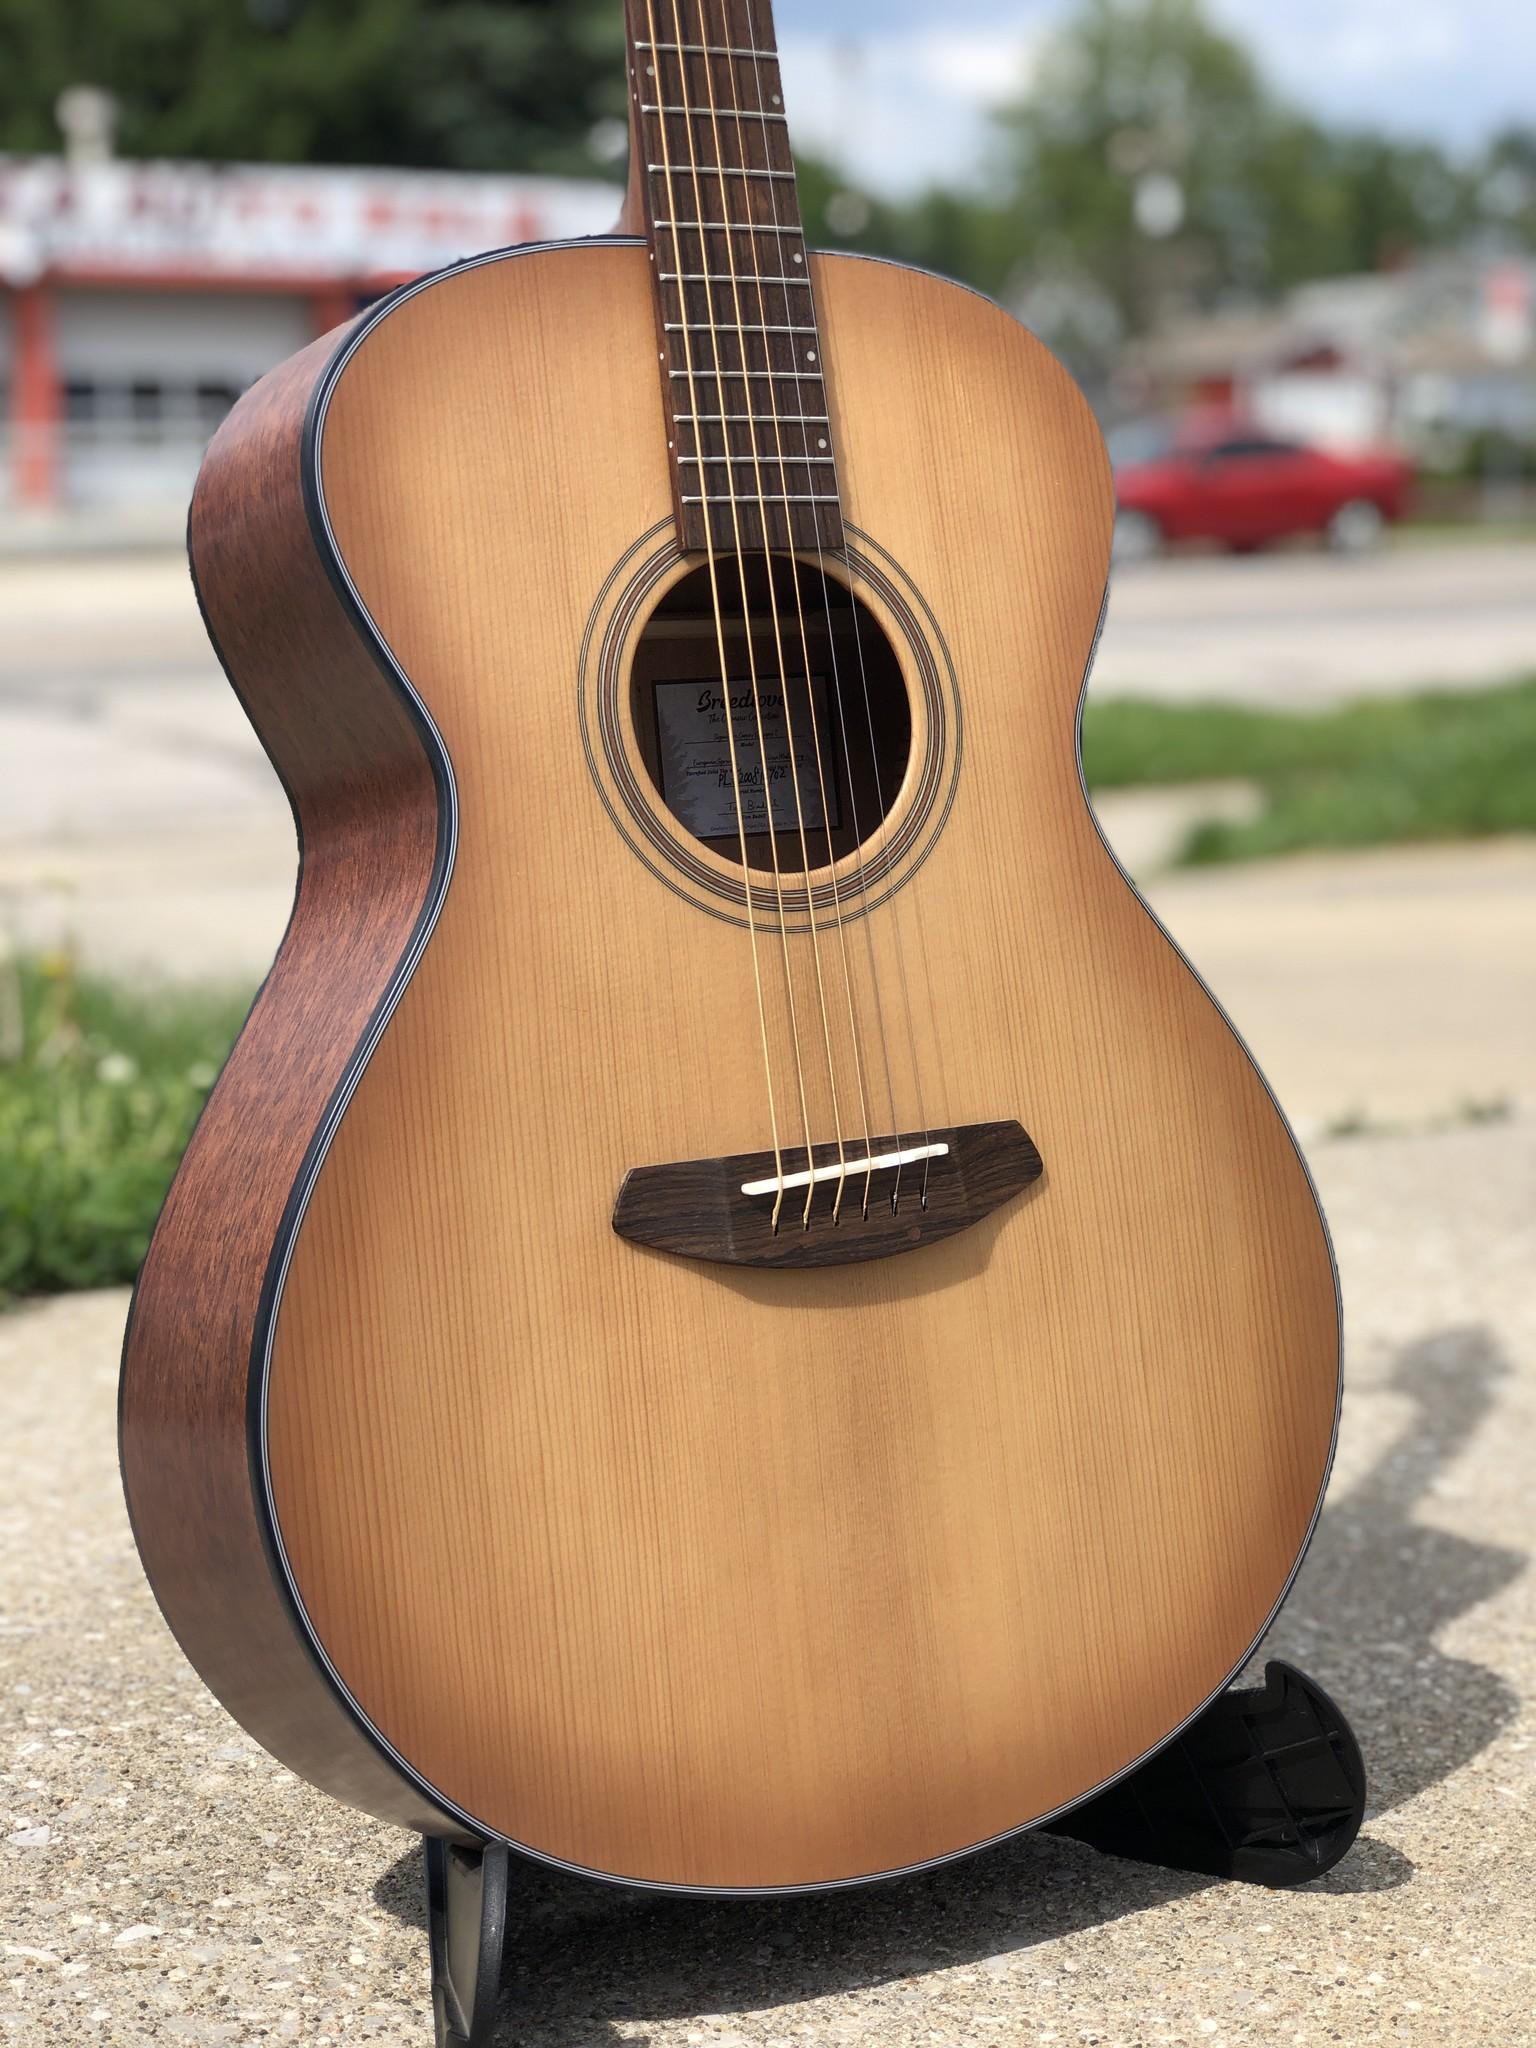 Breedlove Guitars Signature Concert Copper E Acoustic Electric-2